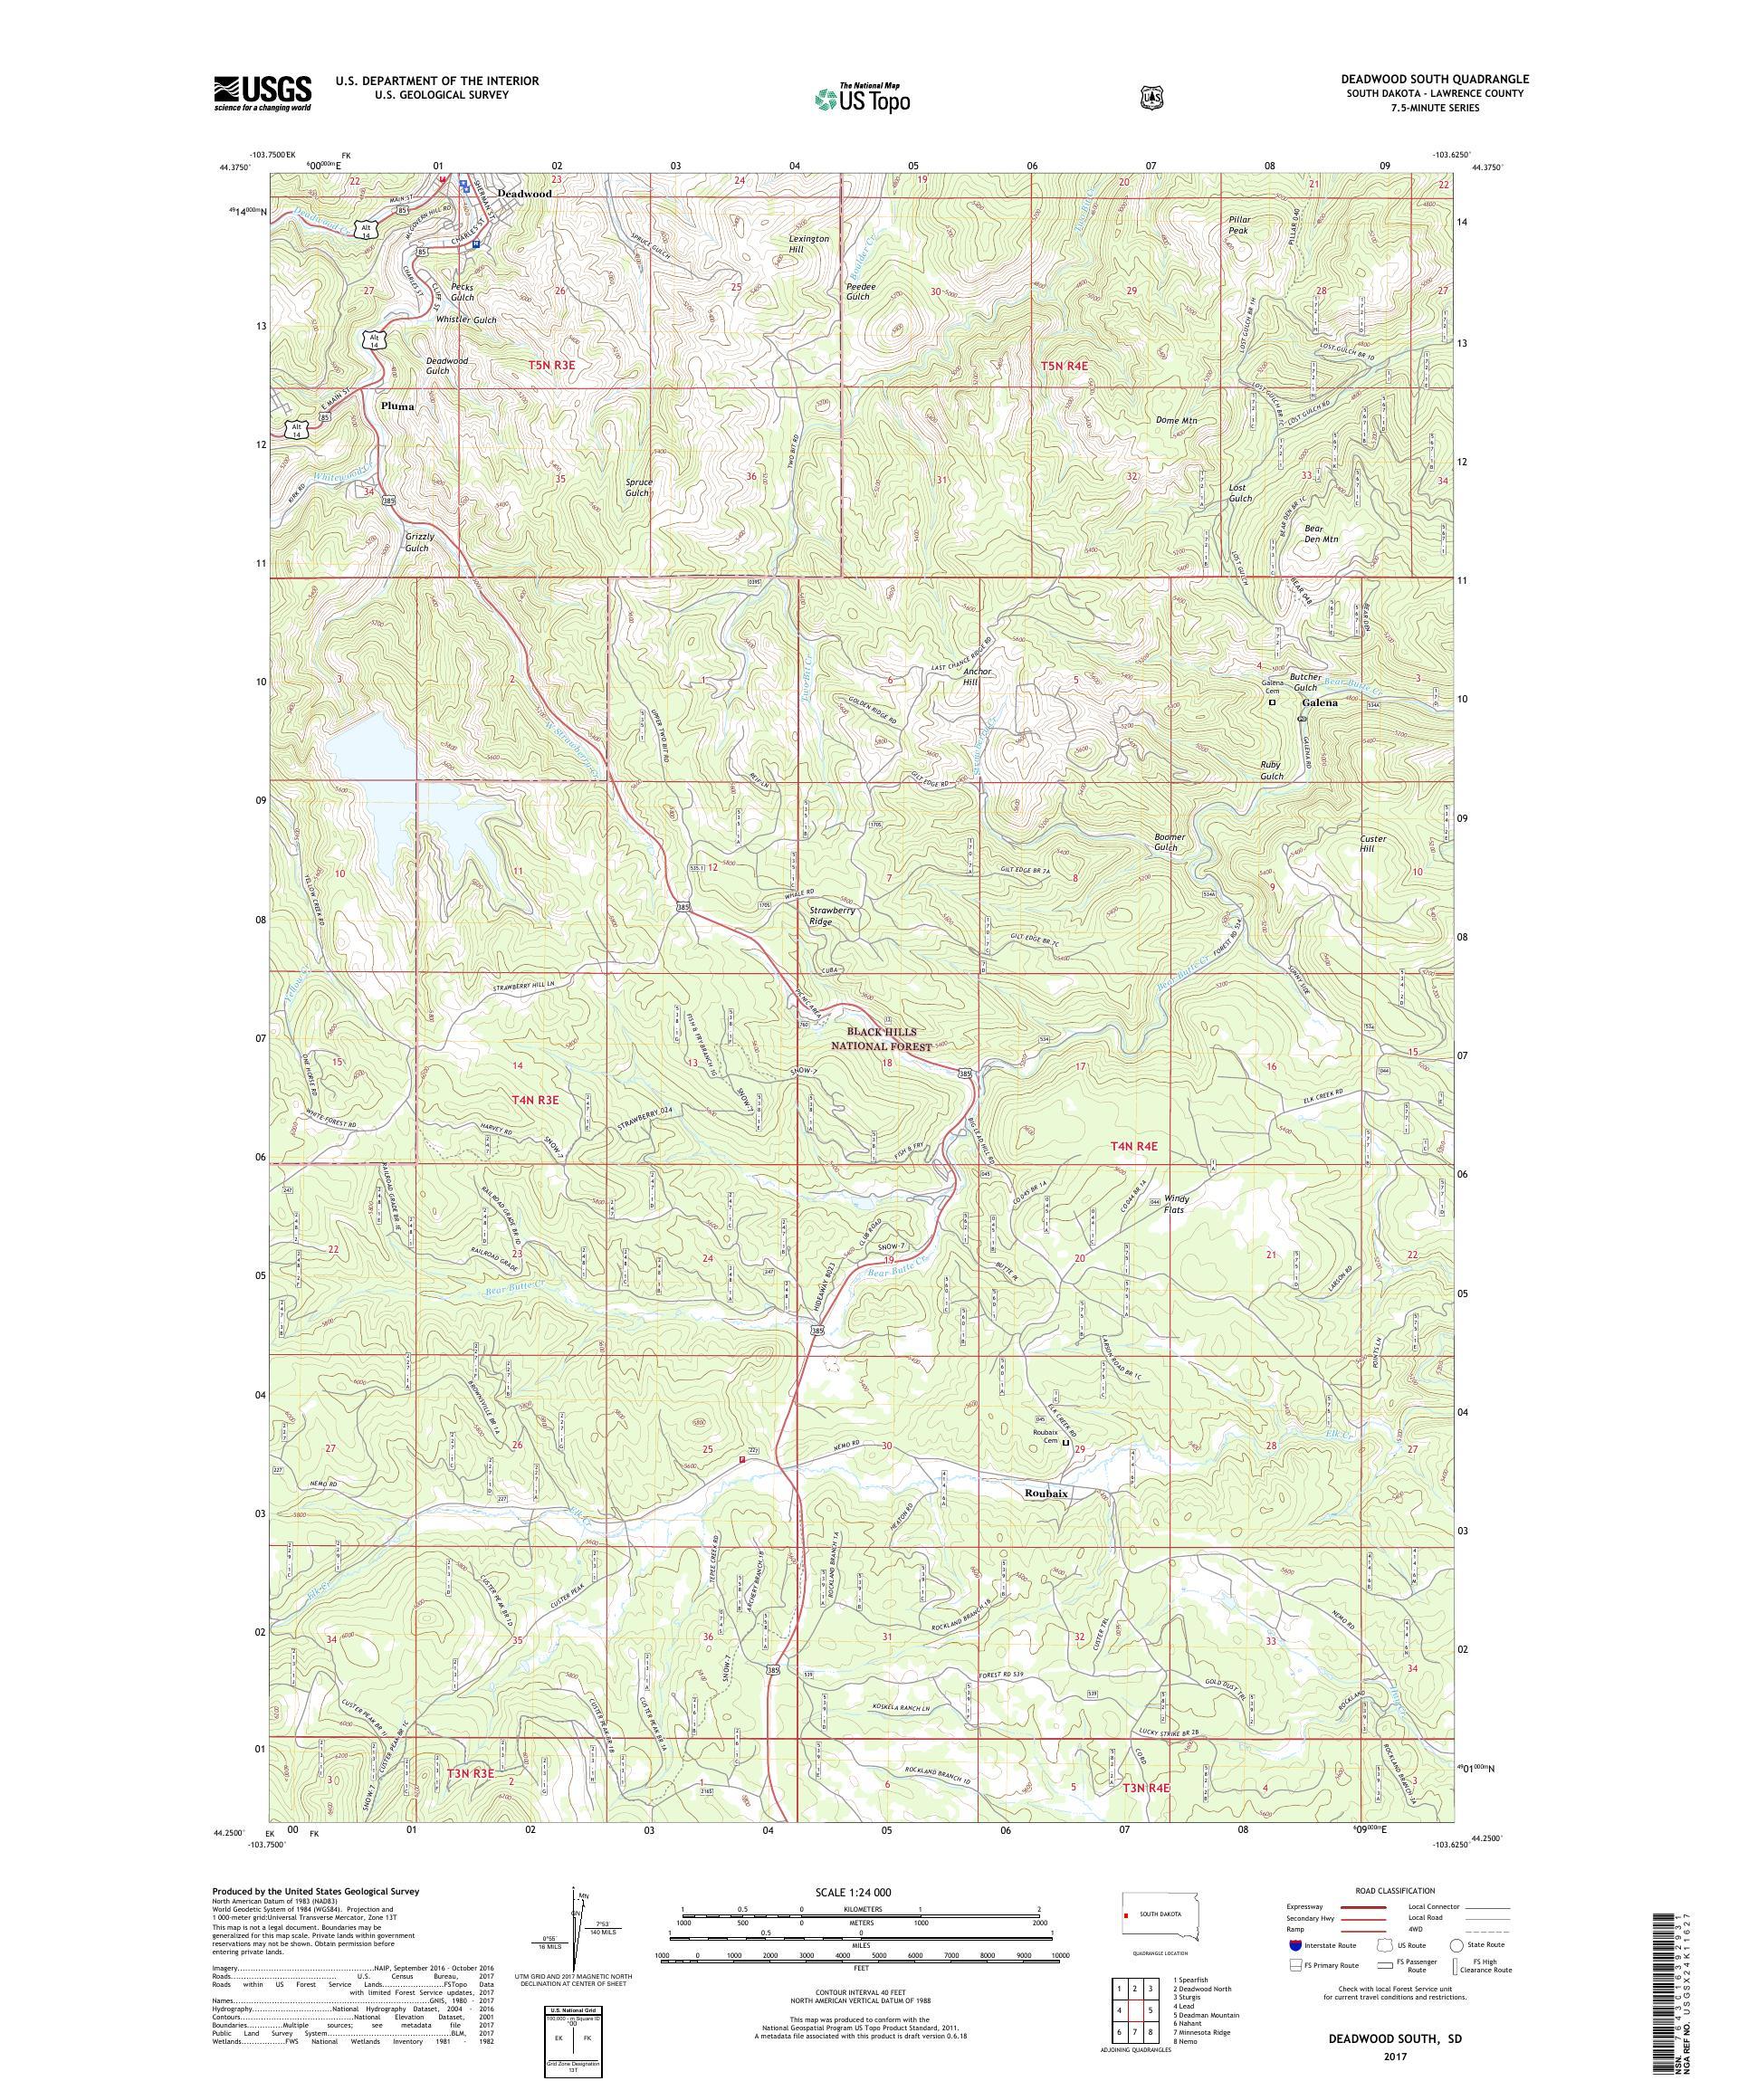 MyTopo Deadwood South, South Dakota USGS Quad Topo Map on